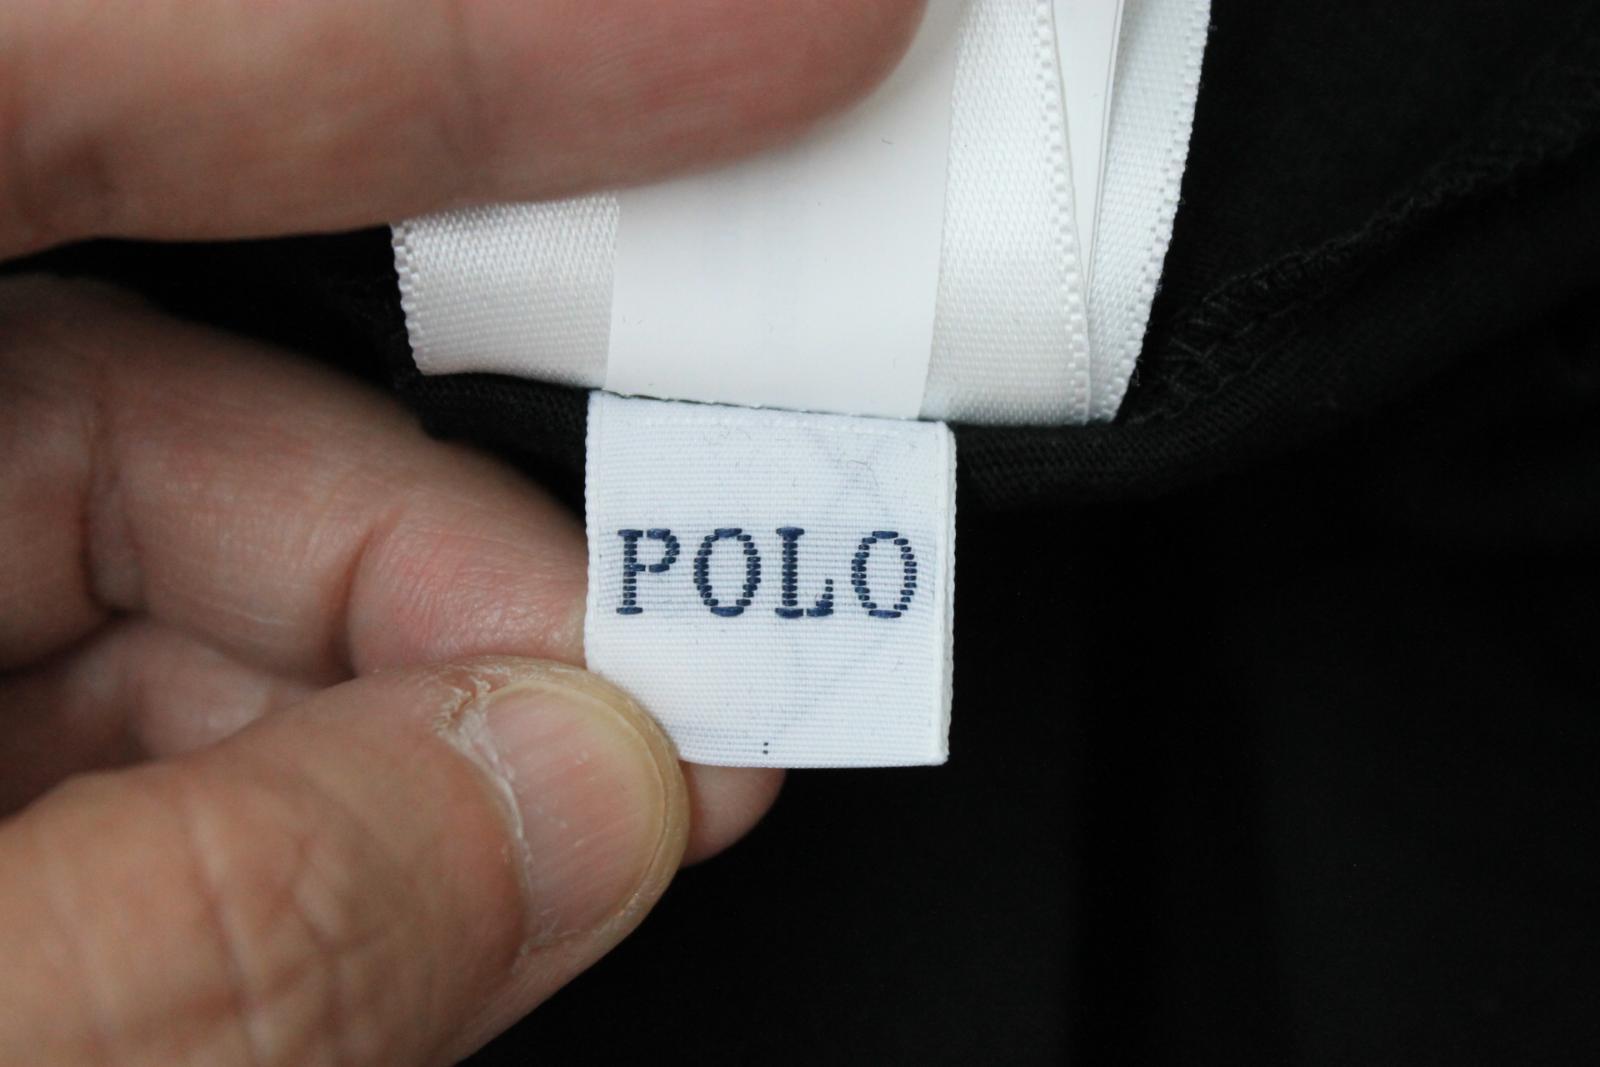 Ralph-Lauren-Polo-para-hombre-de-Big-Pony-Negra-manga-corta-camiseta-tamano-5XB-BNWT miniatura 11